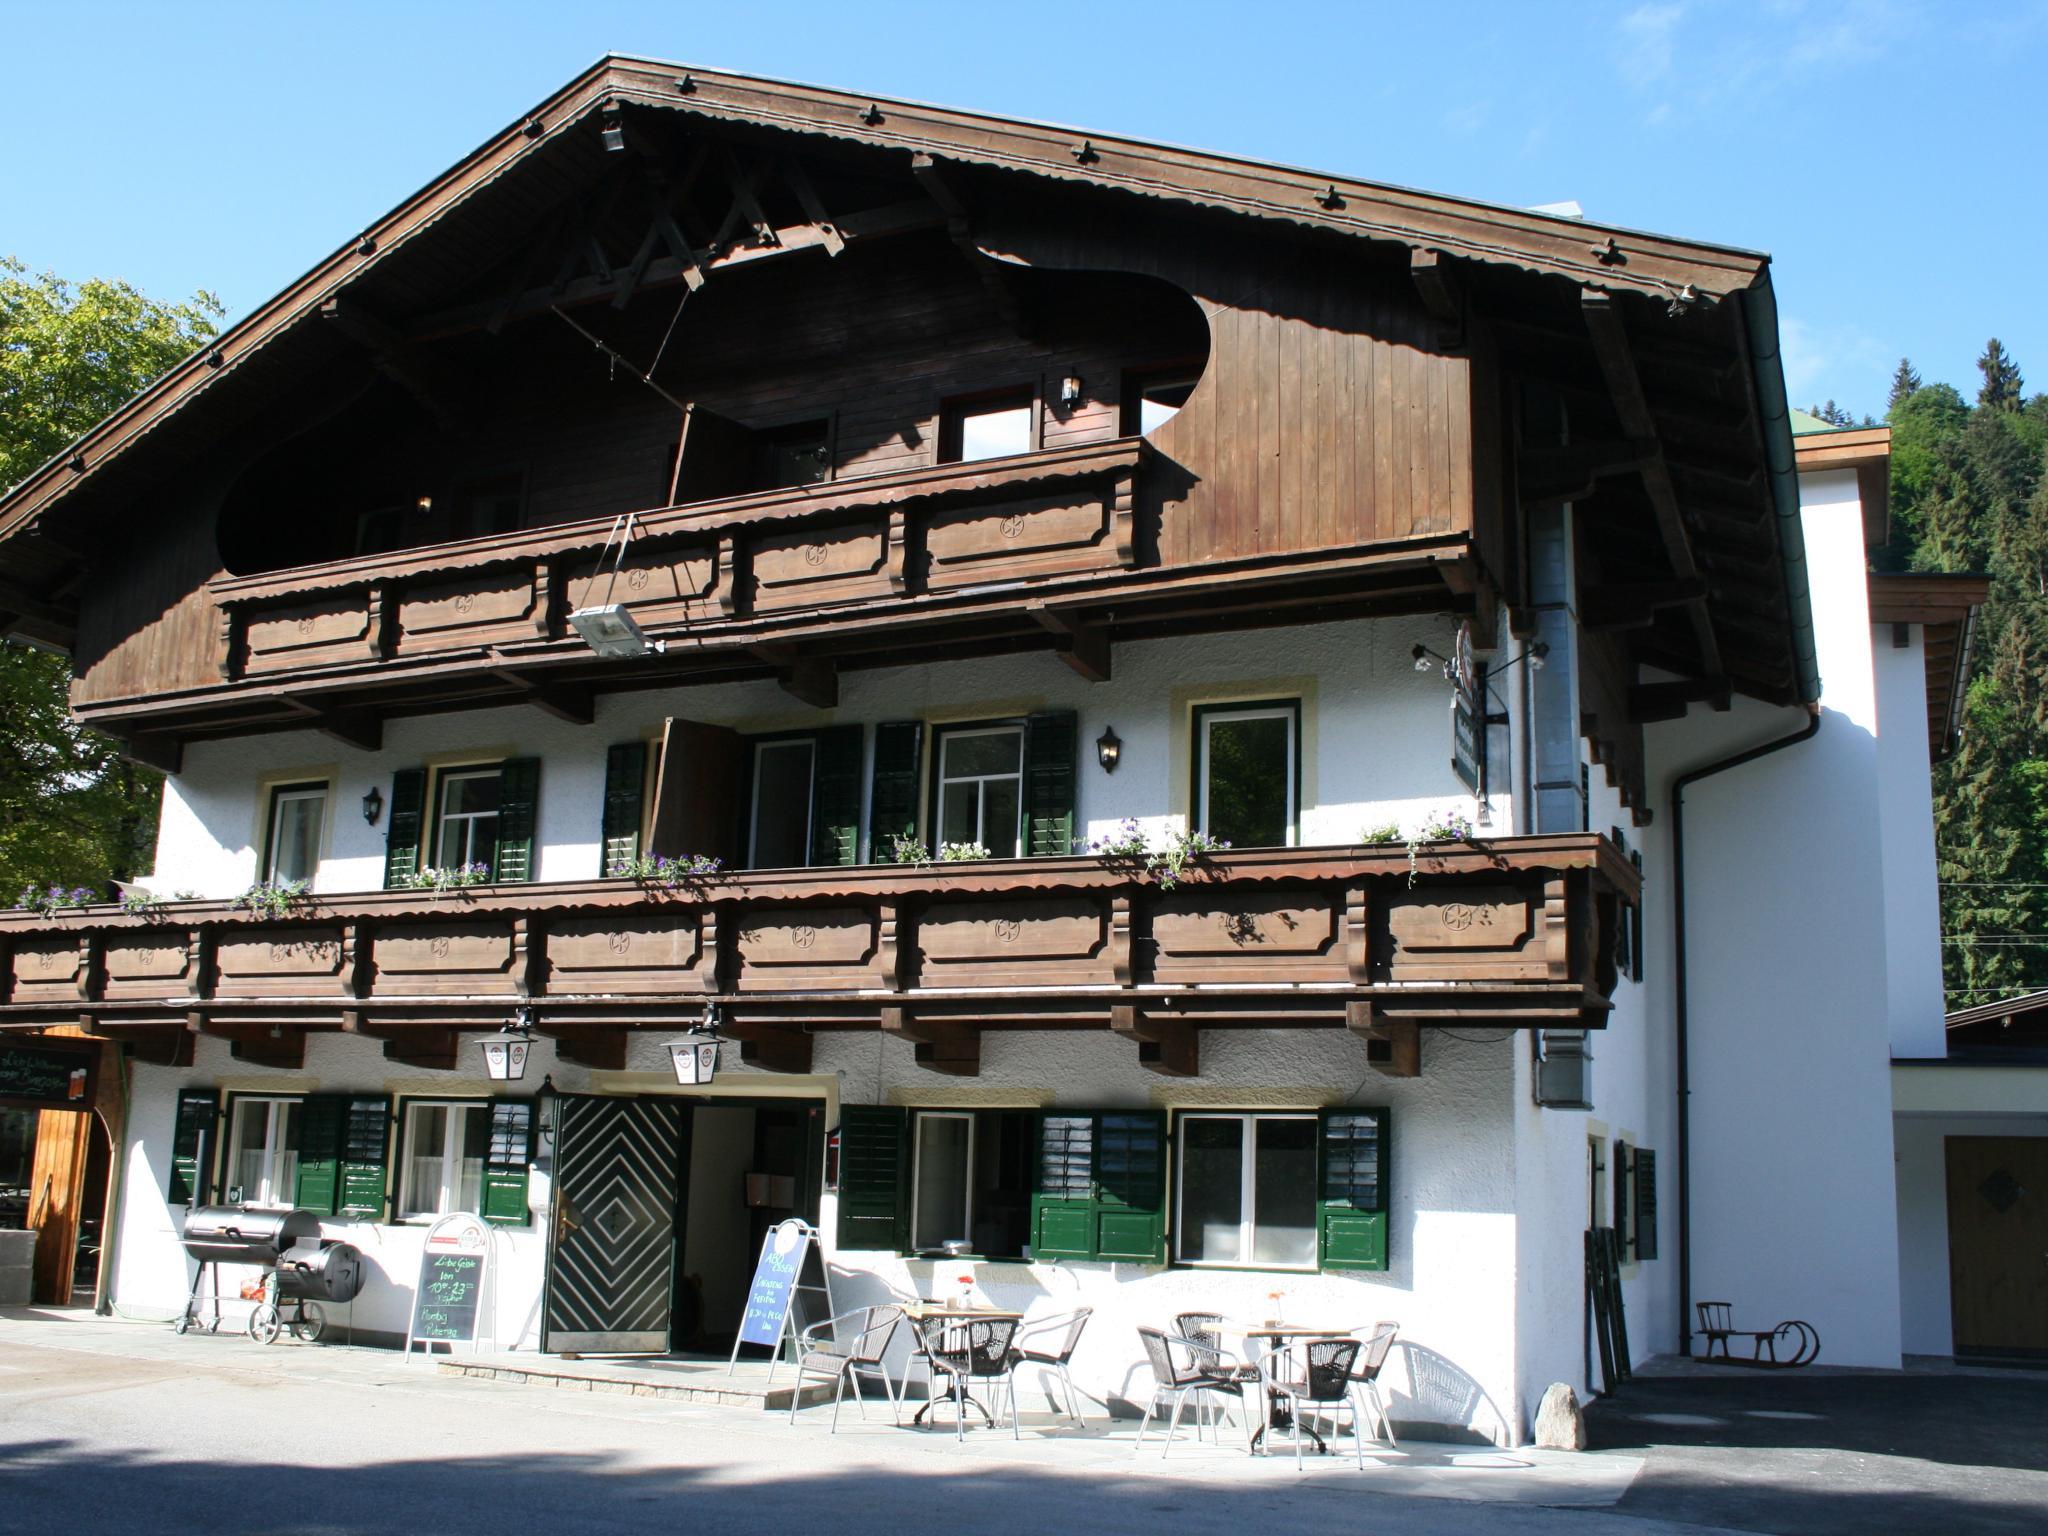 Grieswirt L Tirol